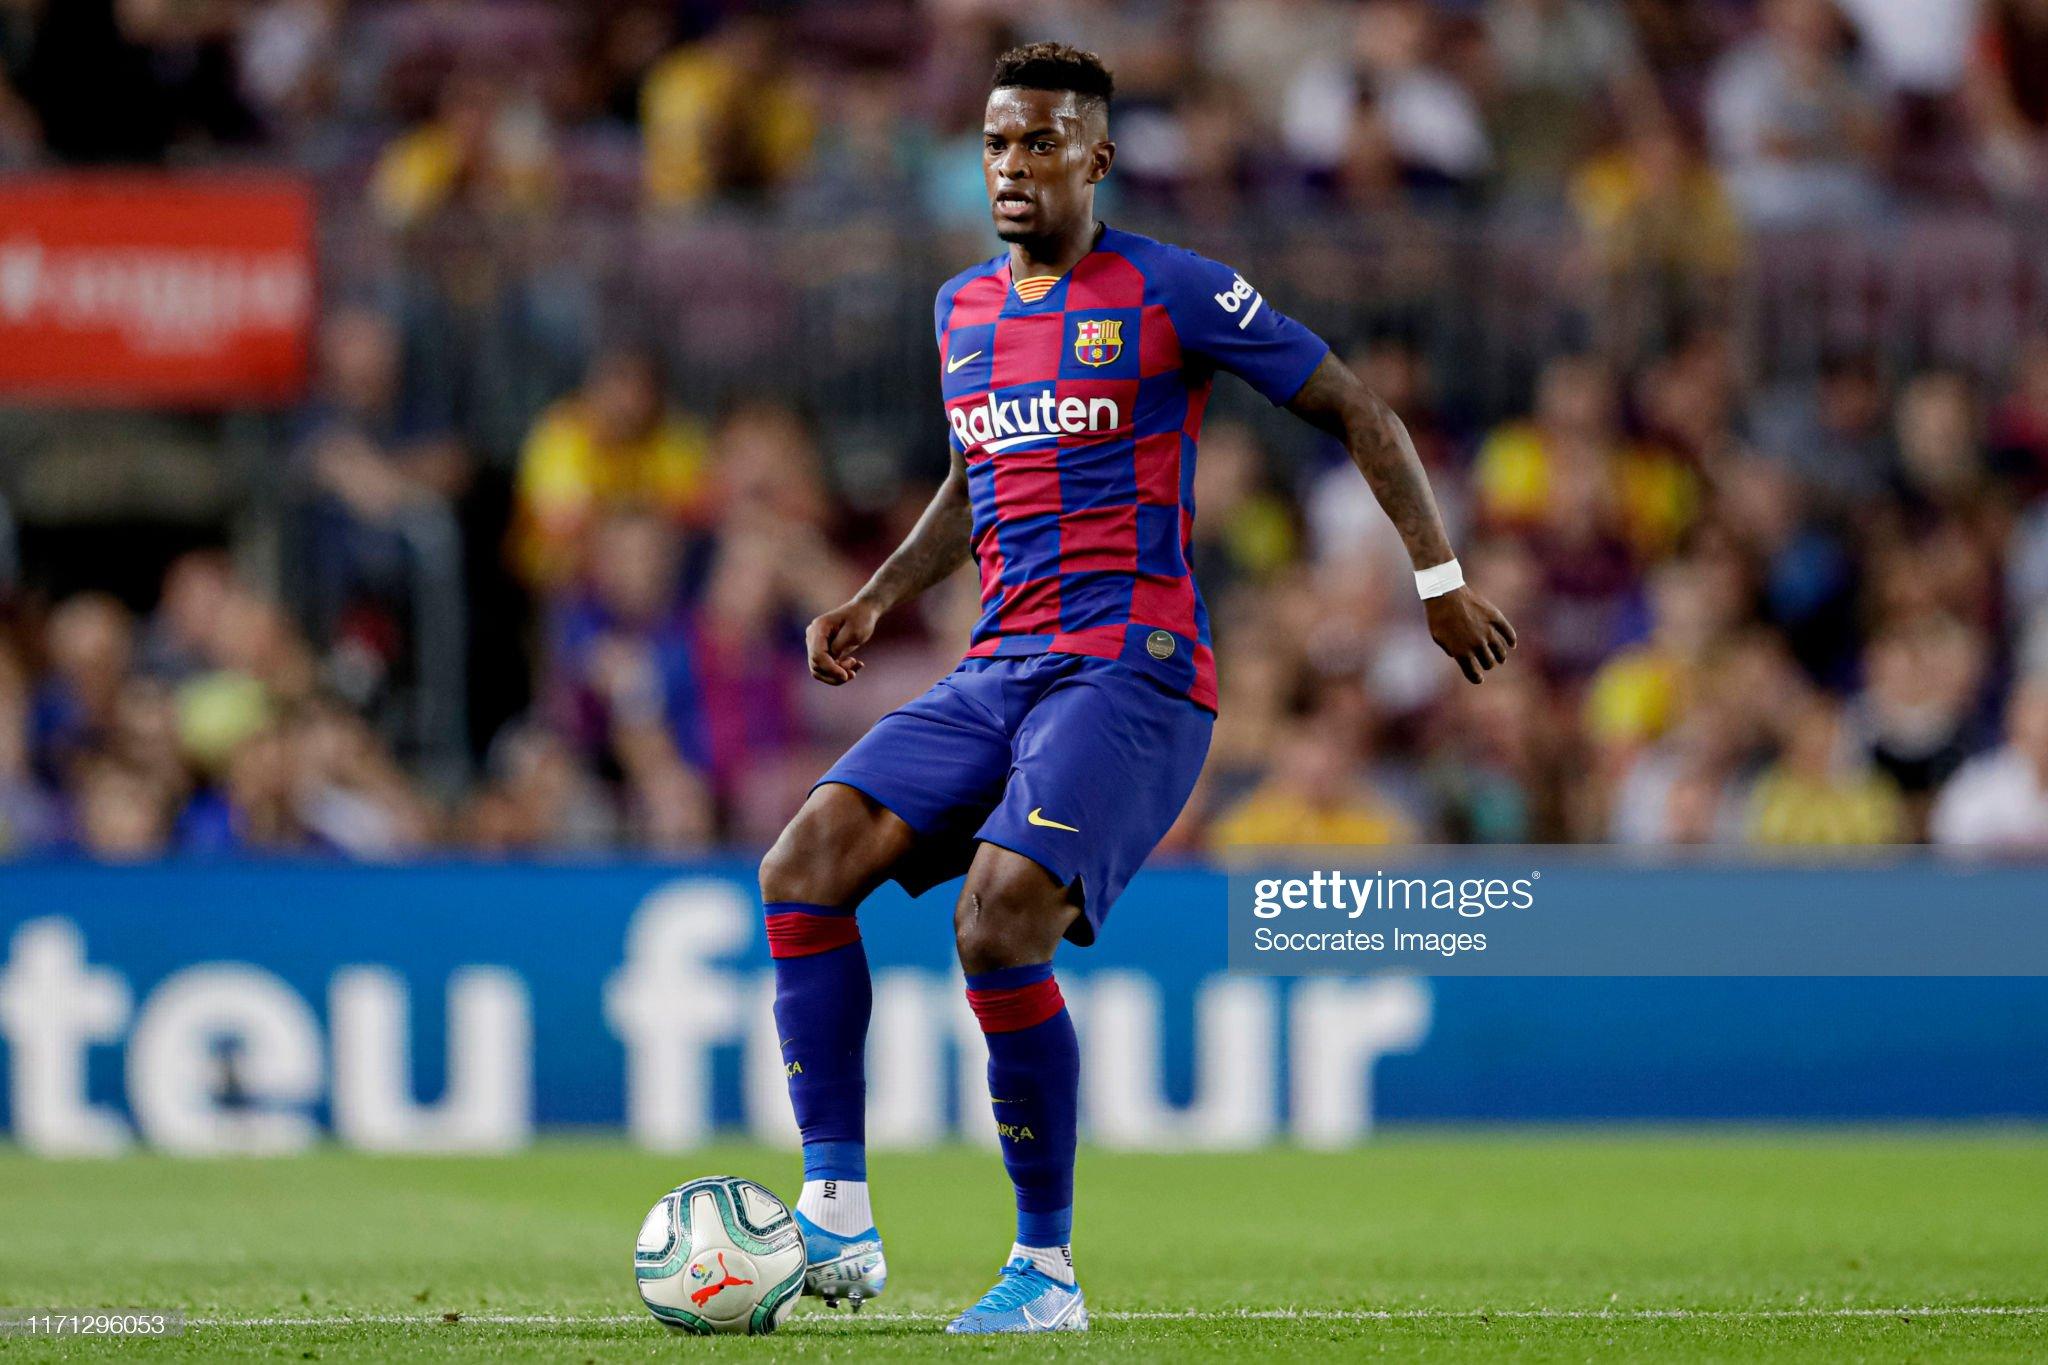 صور مباراة : برشلونة - فياريال 2-1 ( 24-09-2019 )  Nelson-semedo-of-fc-barcelona-during-the-la-liga-santander-match-fc-picture-id1171296053?s=2048x2048